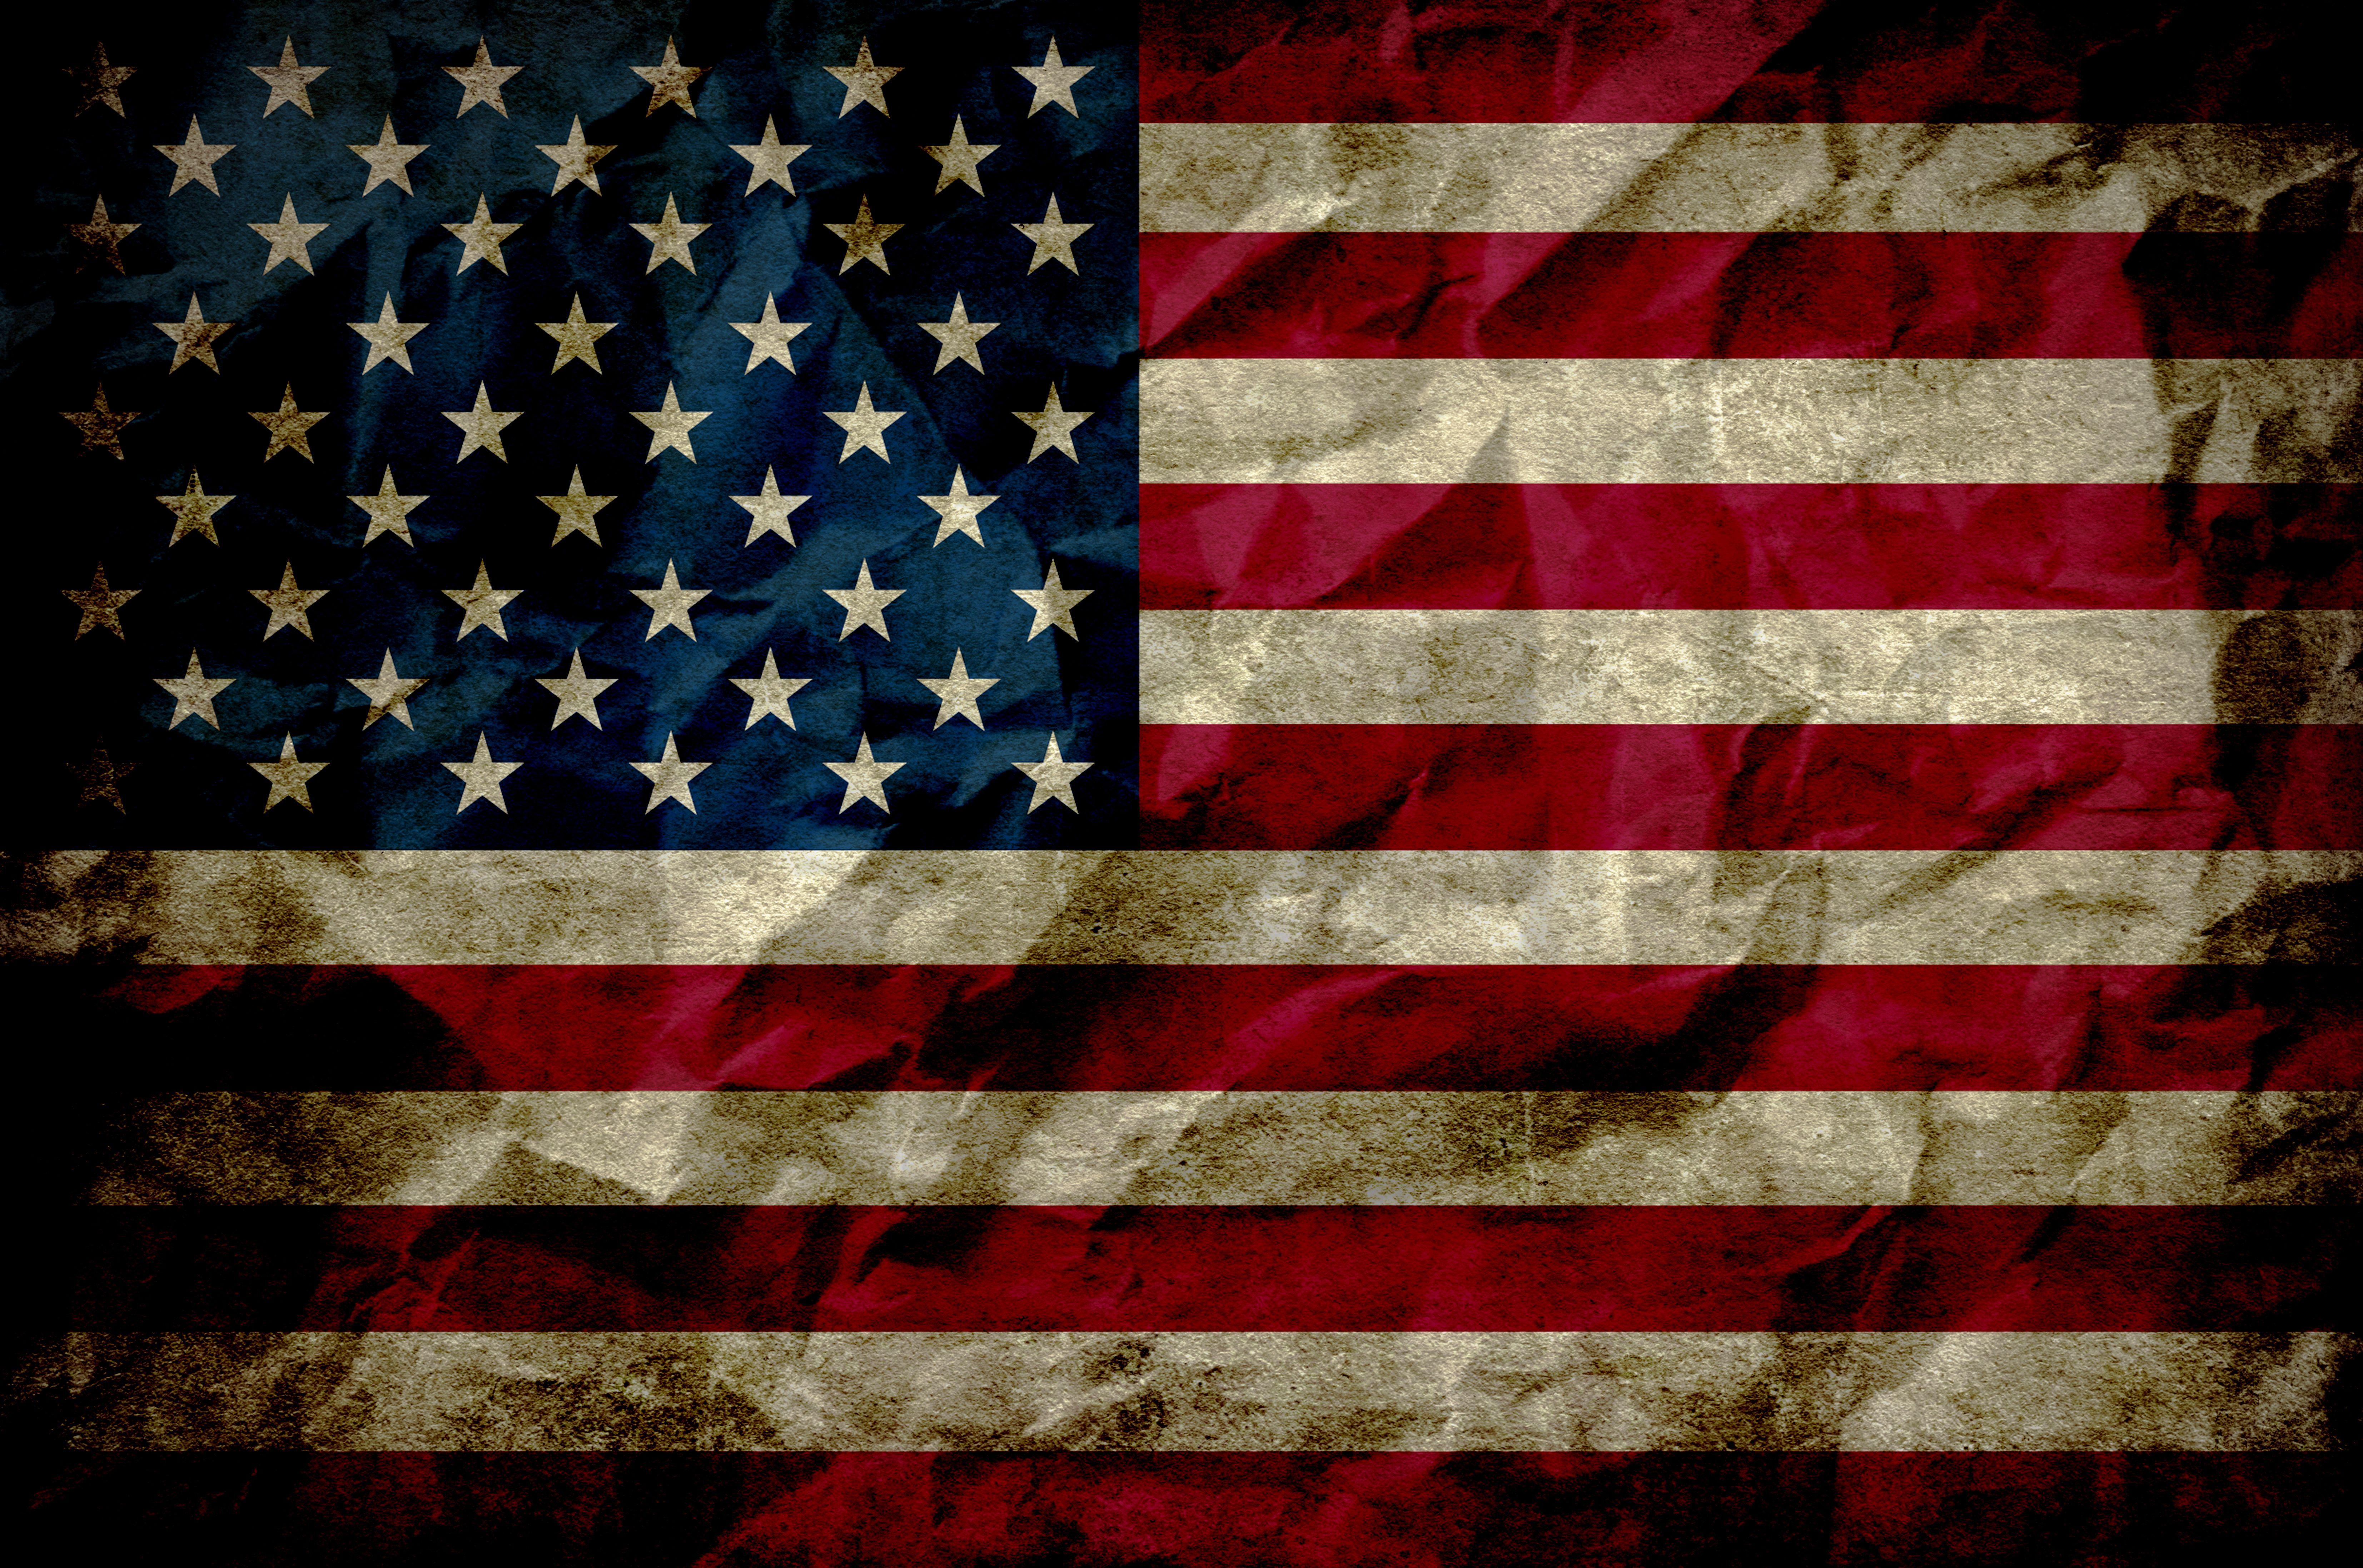 Grunge American Flag Wallpapers Top Free Grunge American Flag Backgrounds Wallpaperaccess